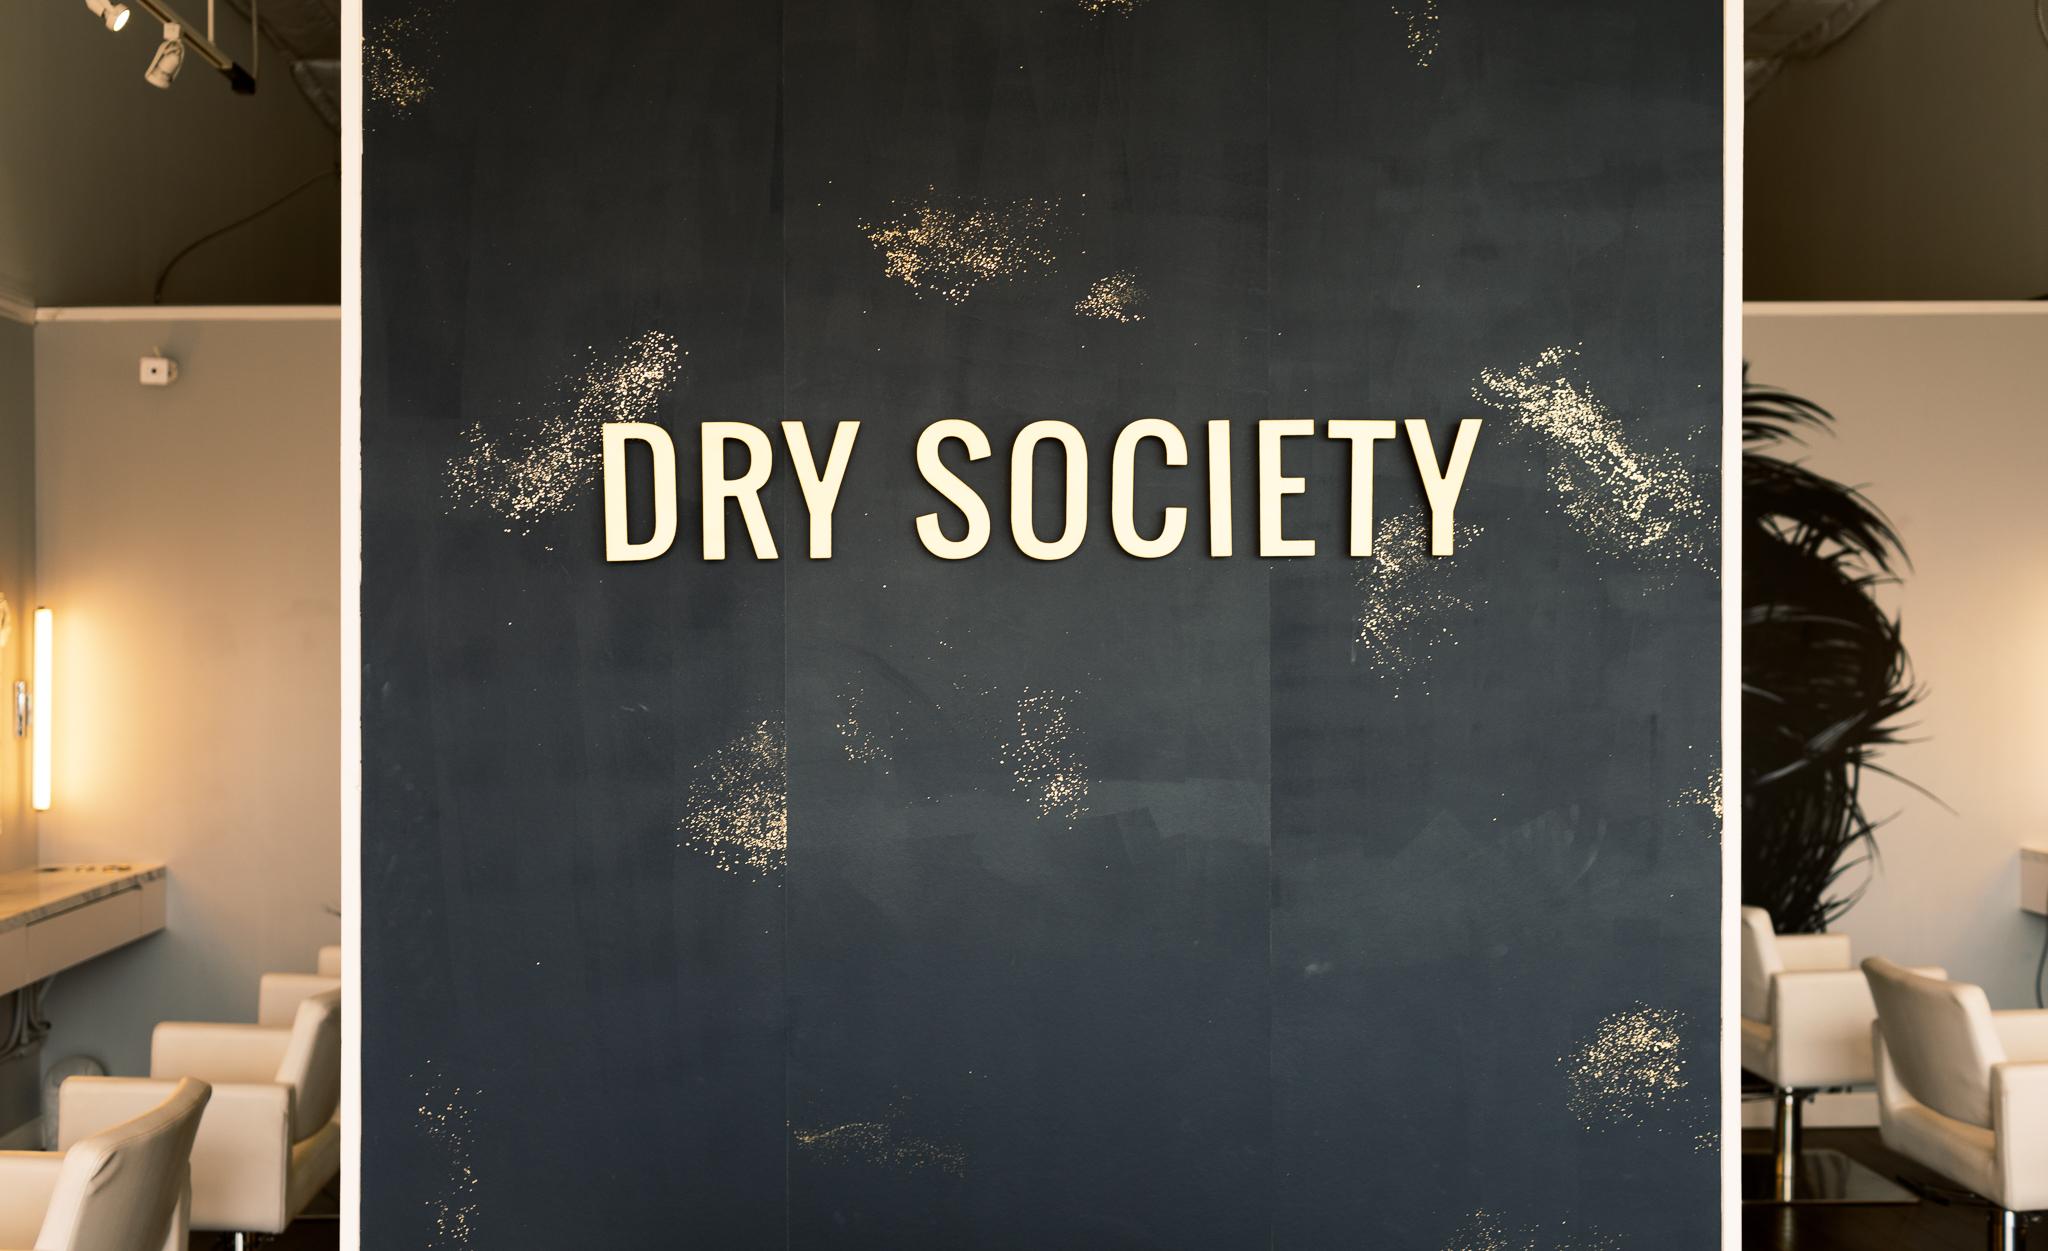 dry society-2.jpg